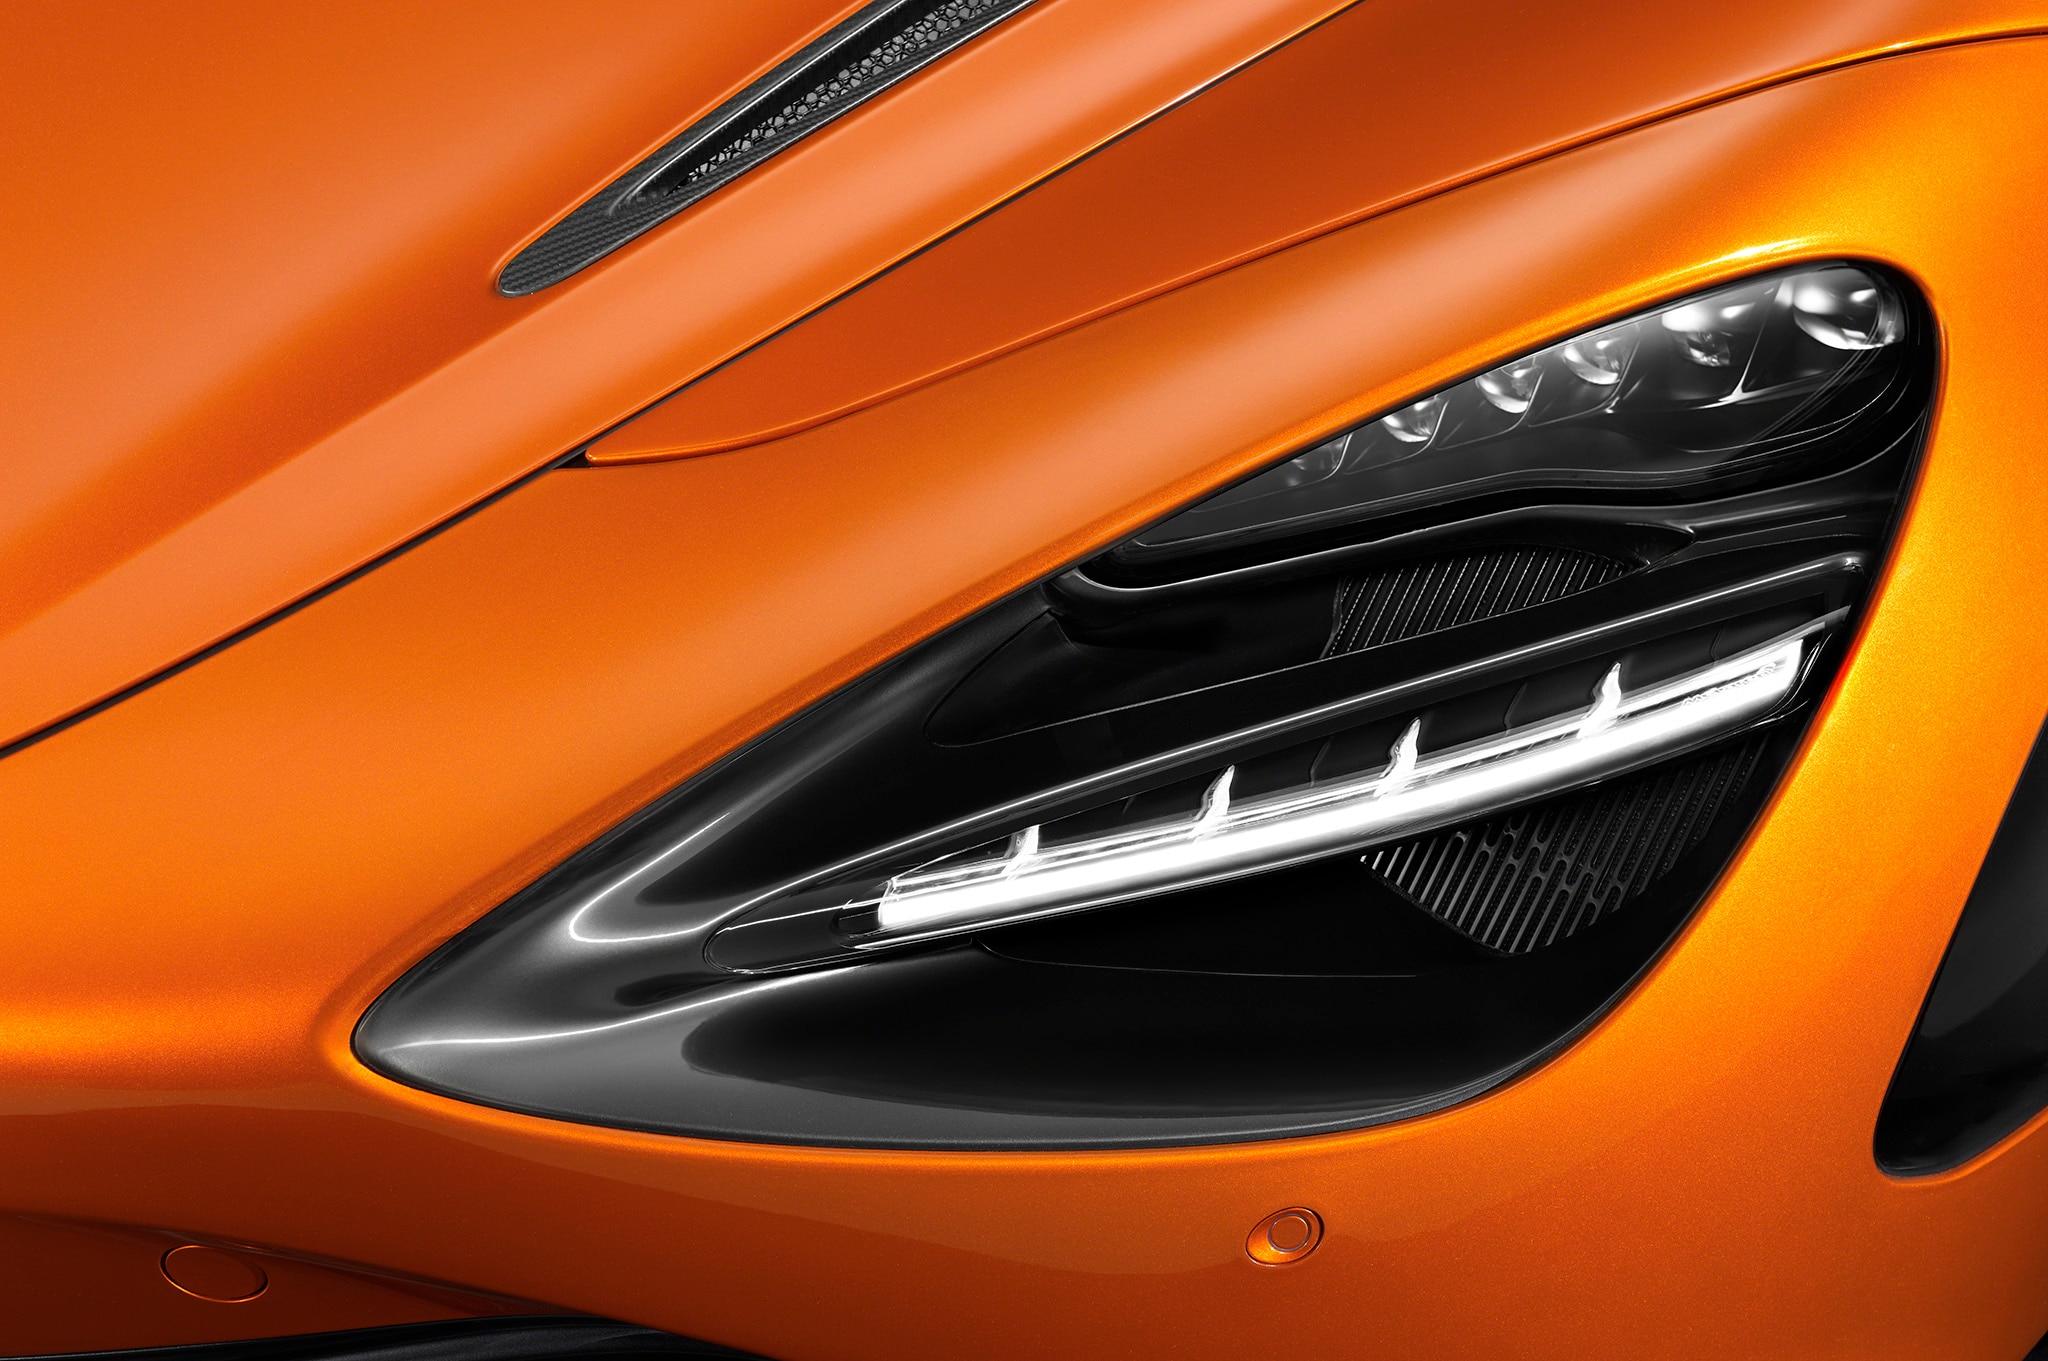 2018 mclaren cars. contemporary cars show more in 2018 mclaren cars